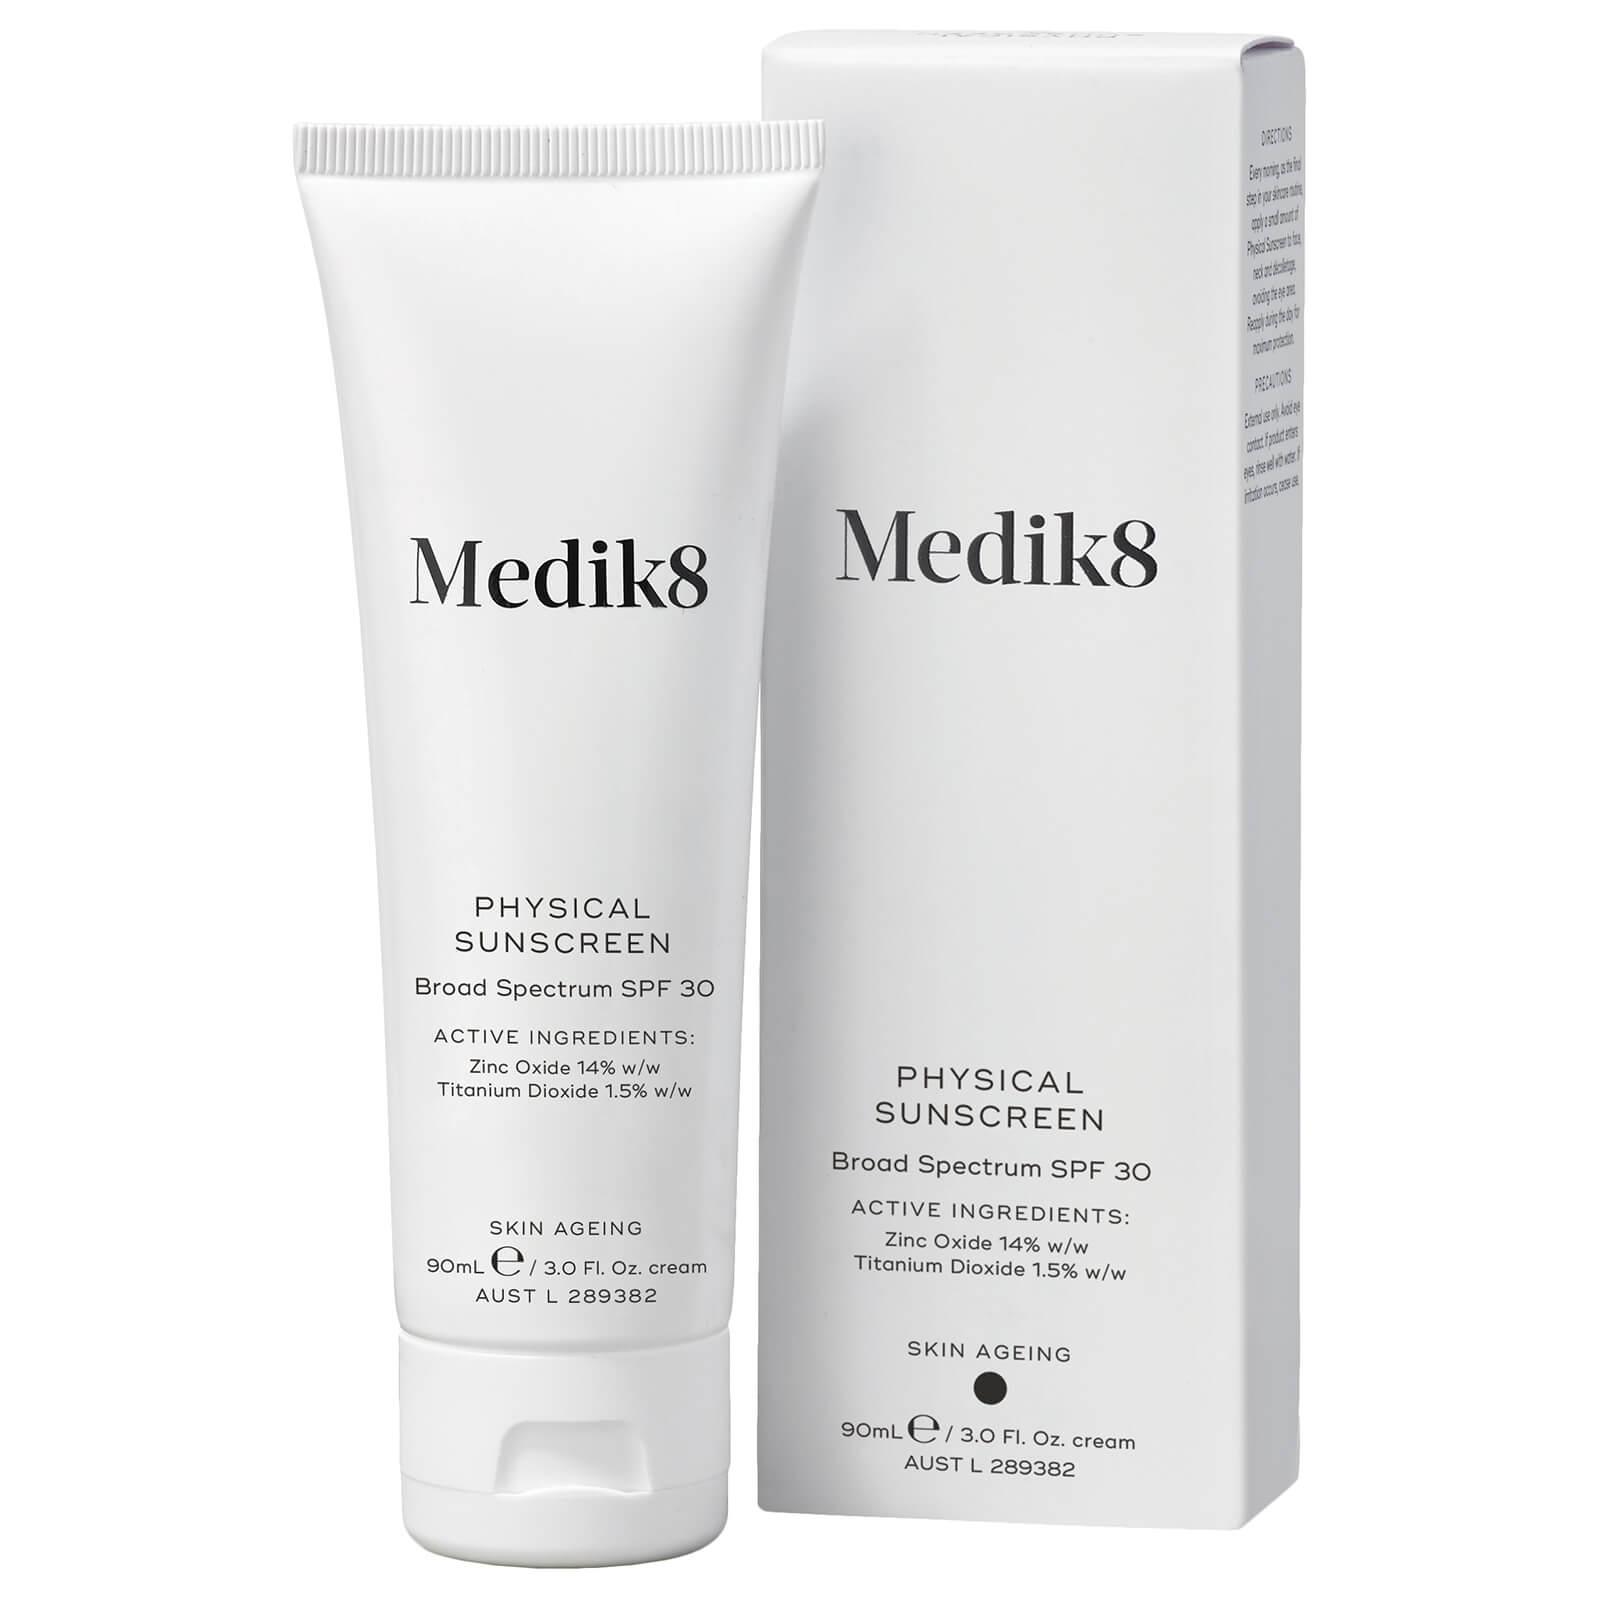 Medik8 Physical Vegan Sunscreen | Stay at Home Mum